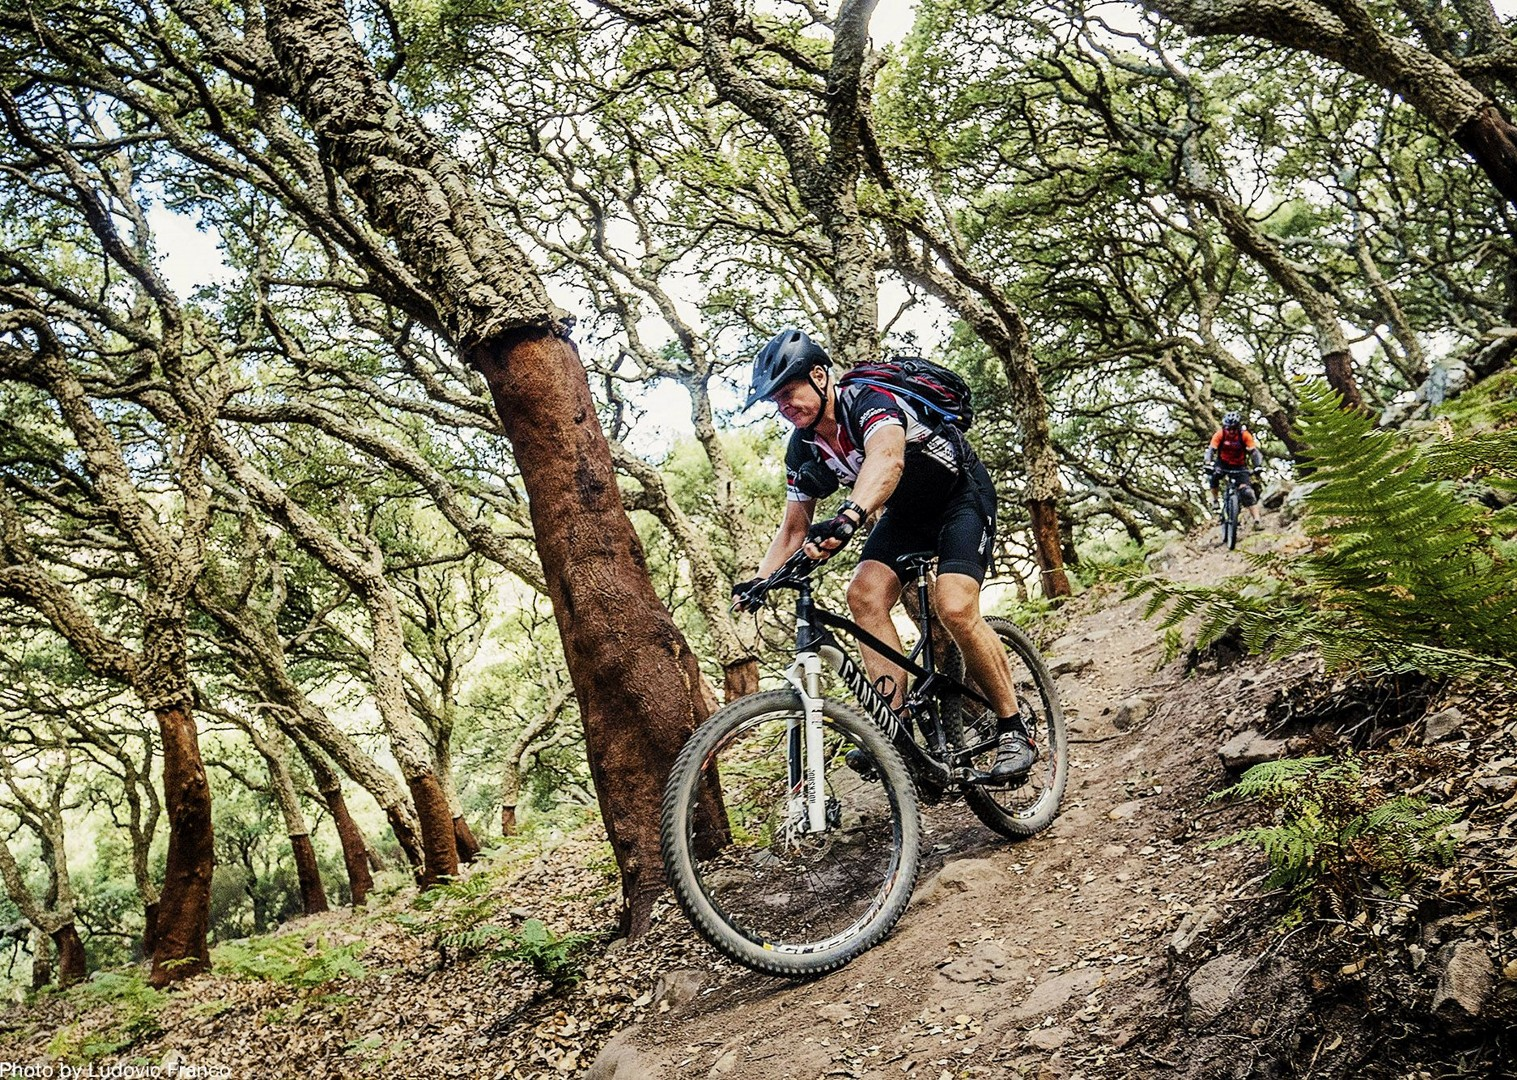 mountain-biking-andalucia-tarifa-singletrack.jpg - Spain - Awesome Andalucia - Guided Mountain Bike Holiday - Mountain Biking